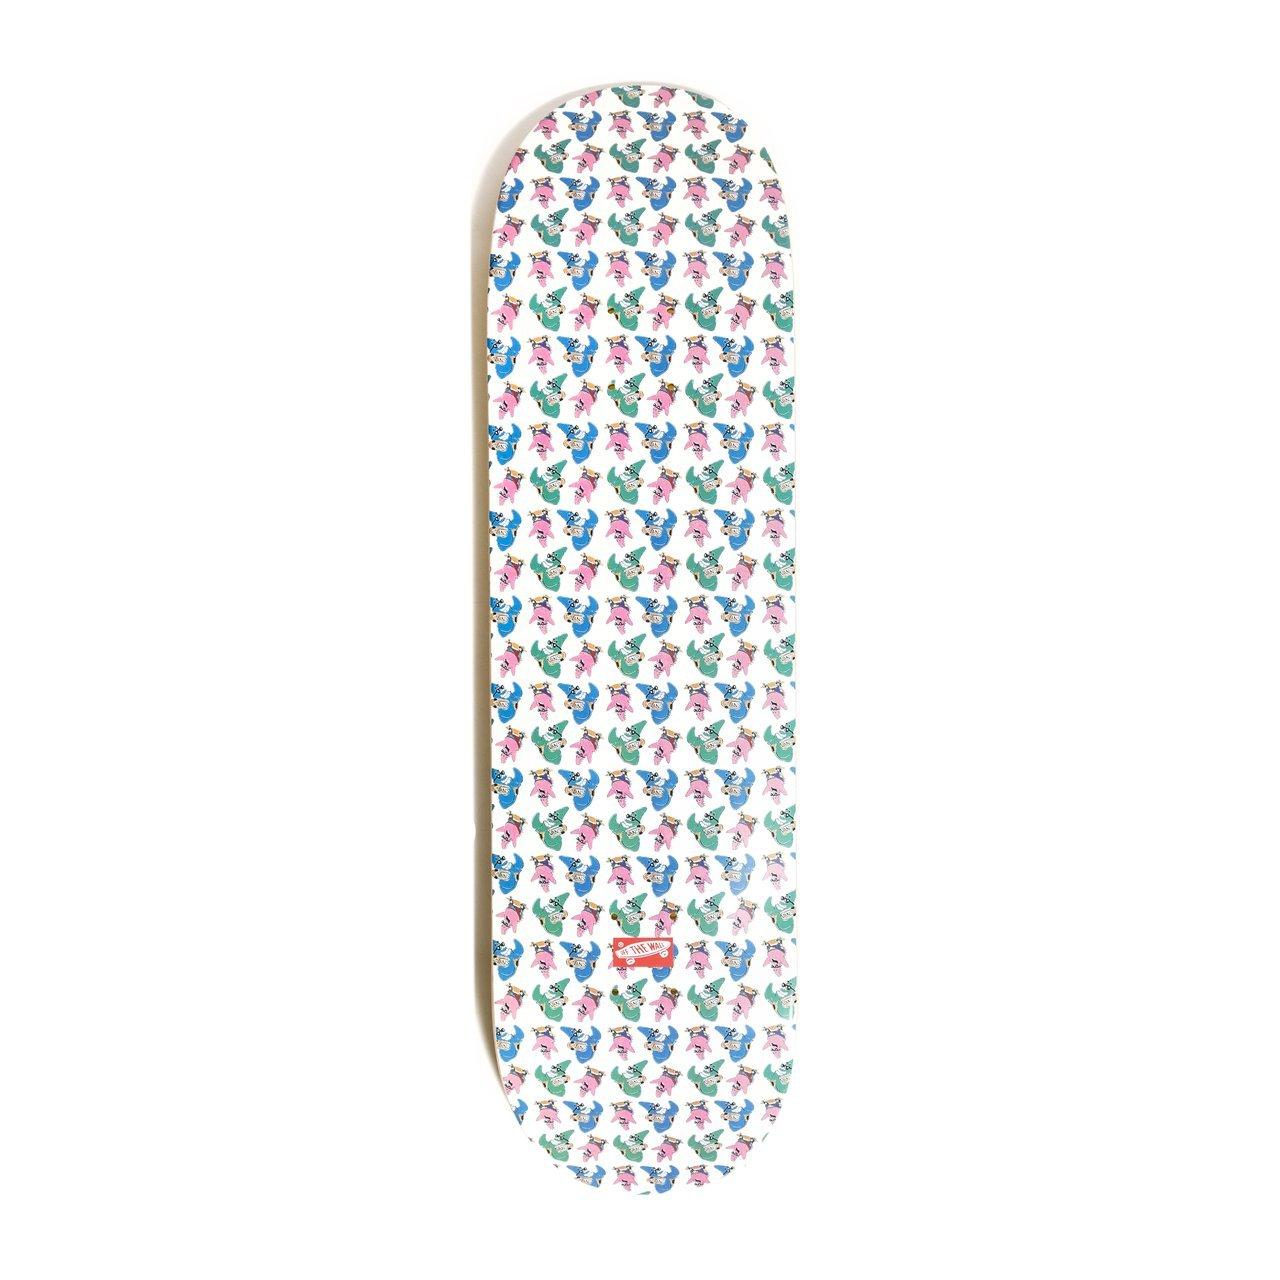 Vans Vault X Spongebob Squarepants Skateboard Deck // \